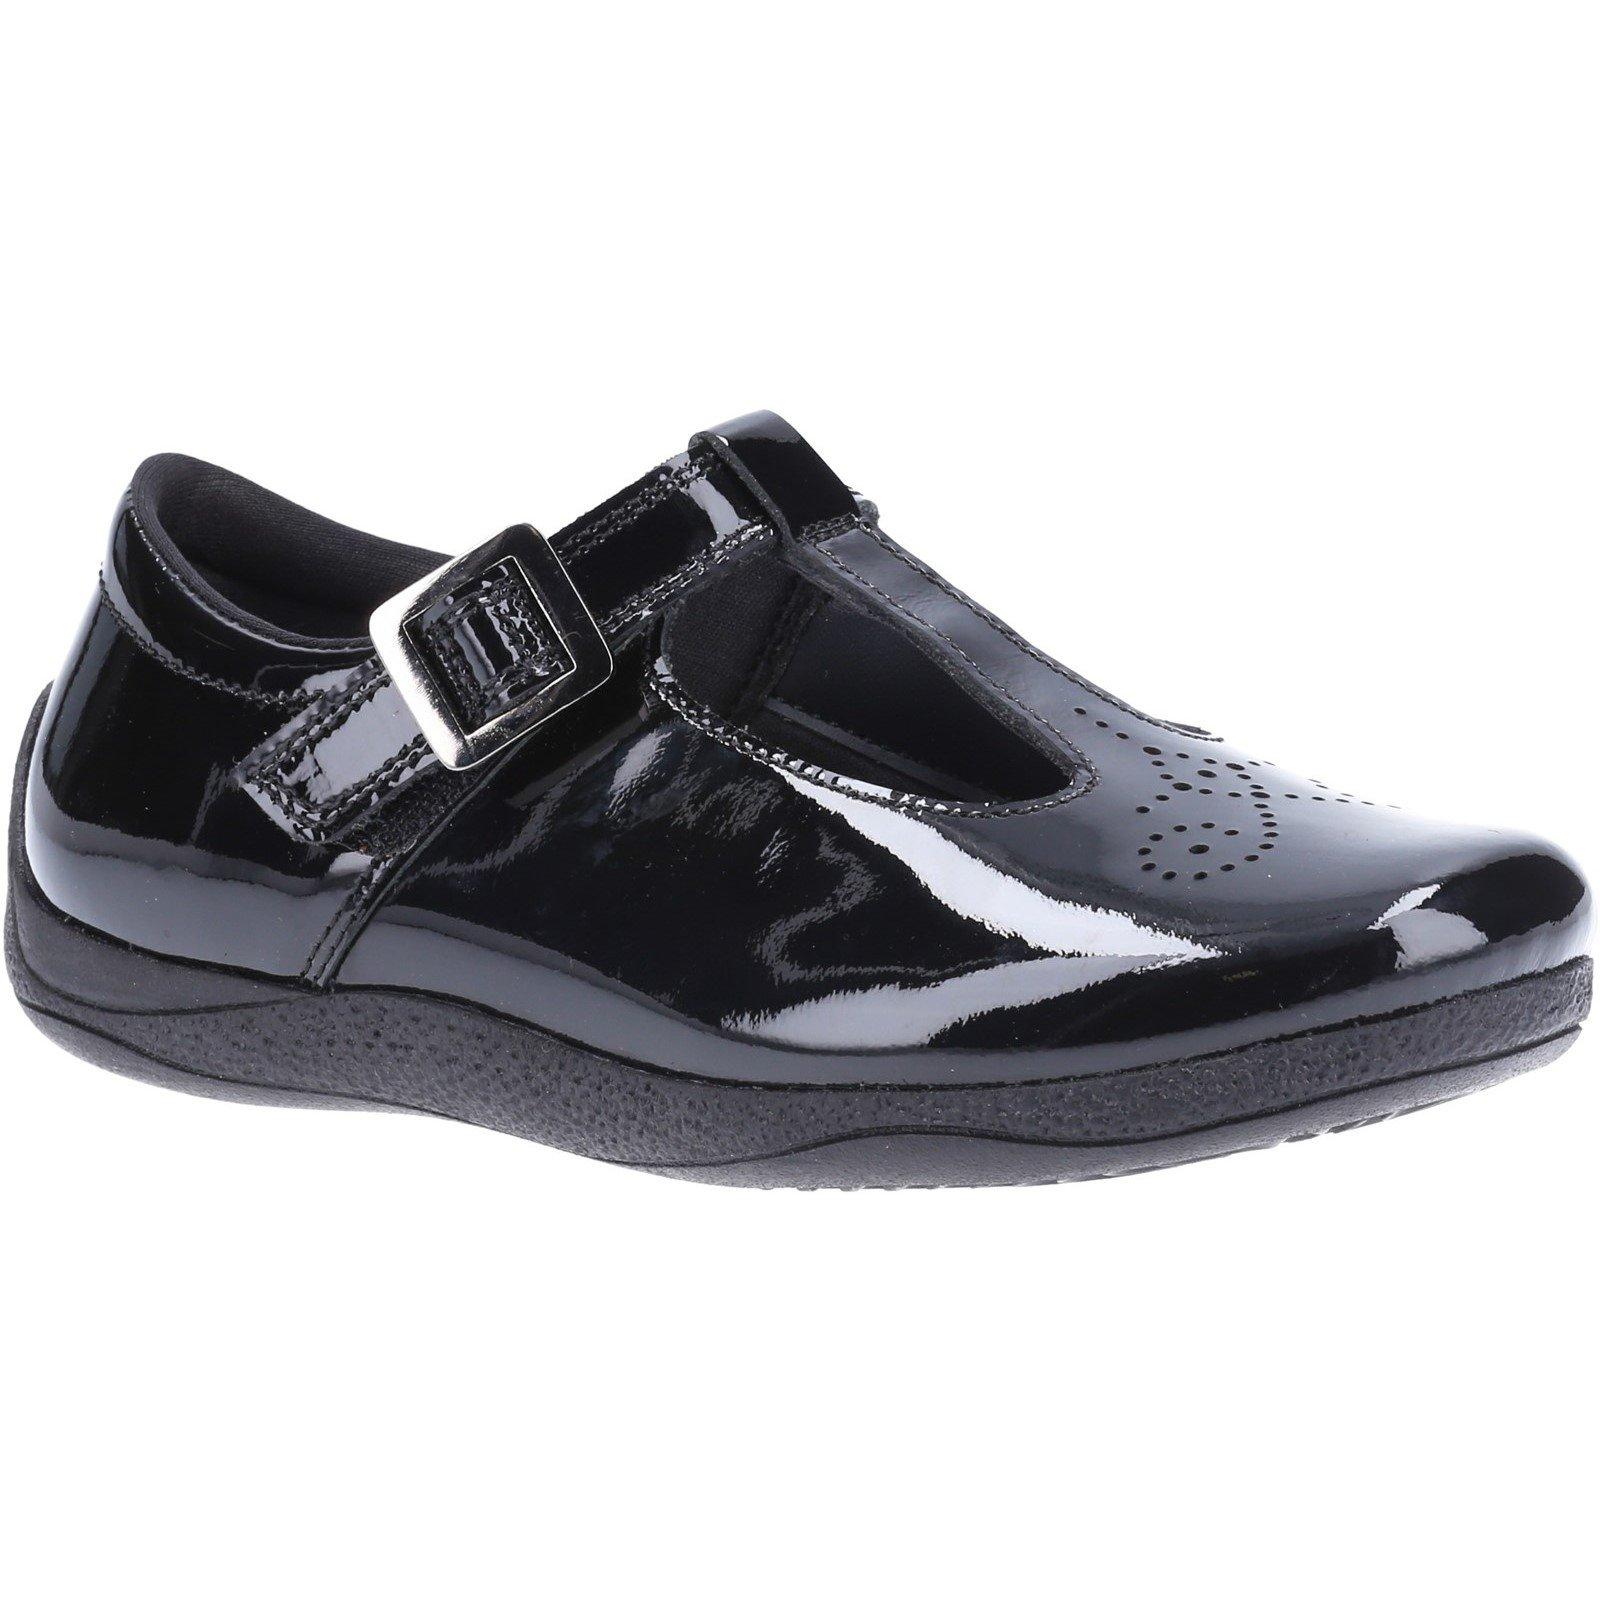 Hush Puppies Kid's Eliza Senior School Shoe Patent Black 32592 - Patent Black 5